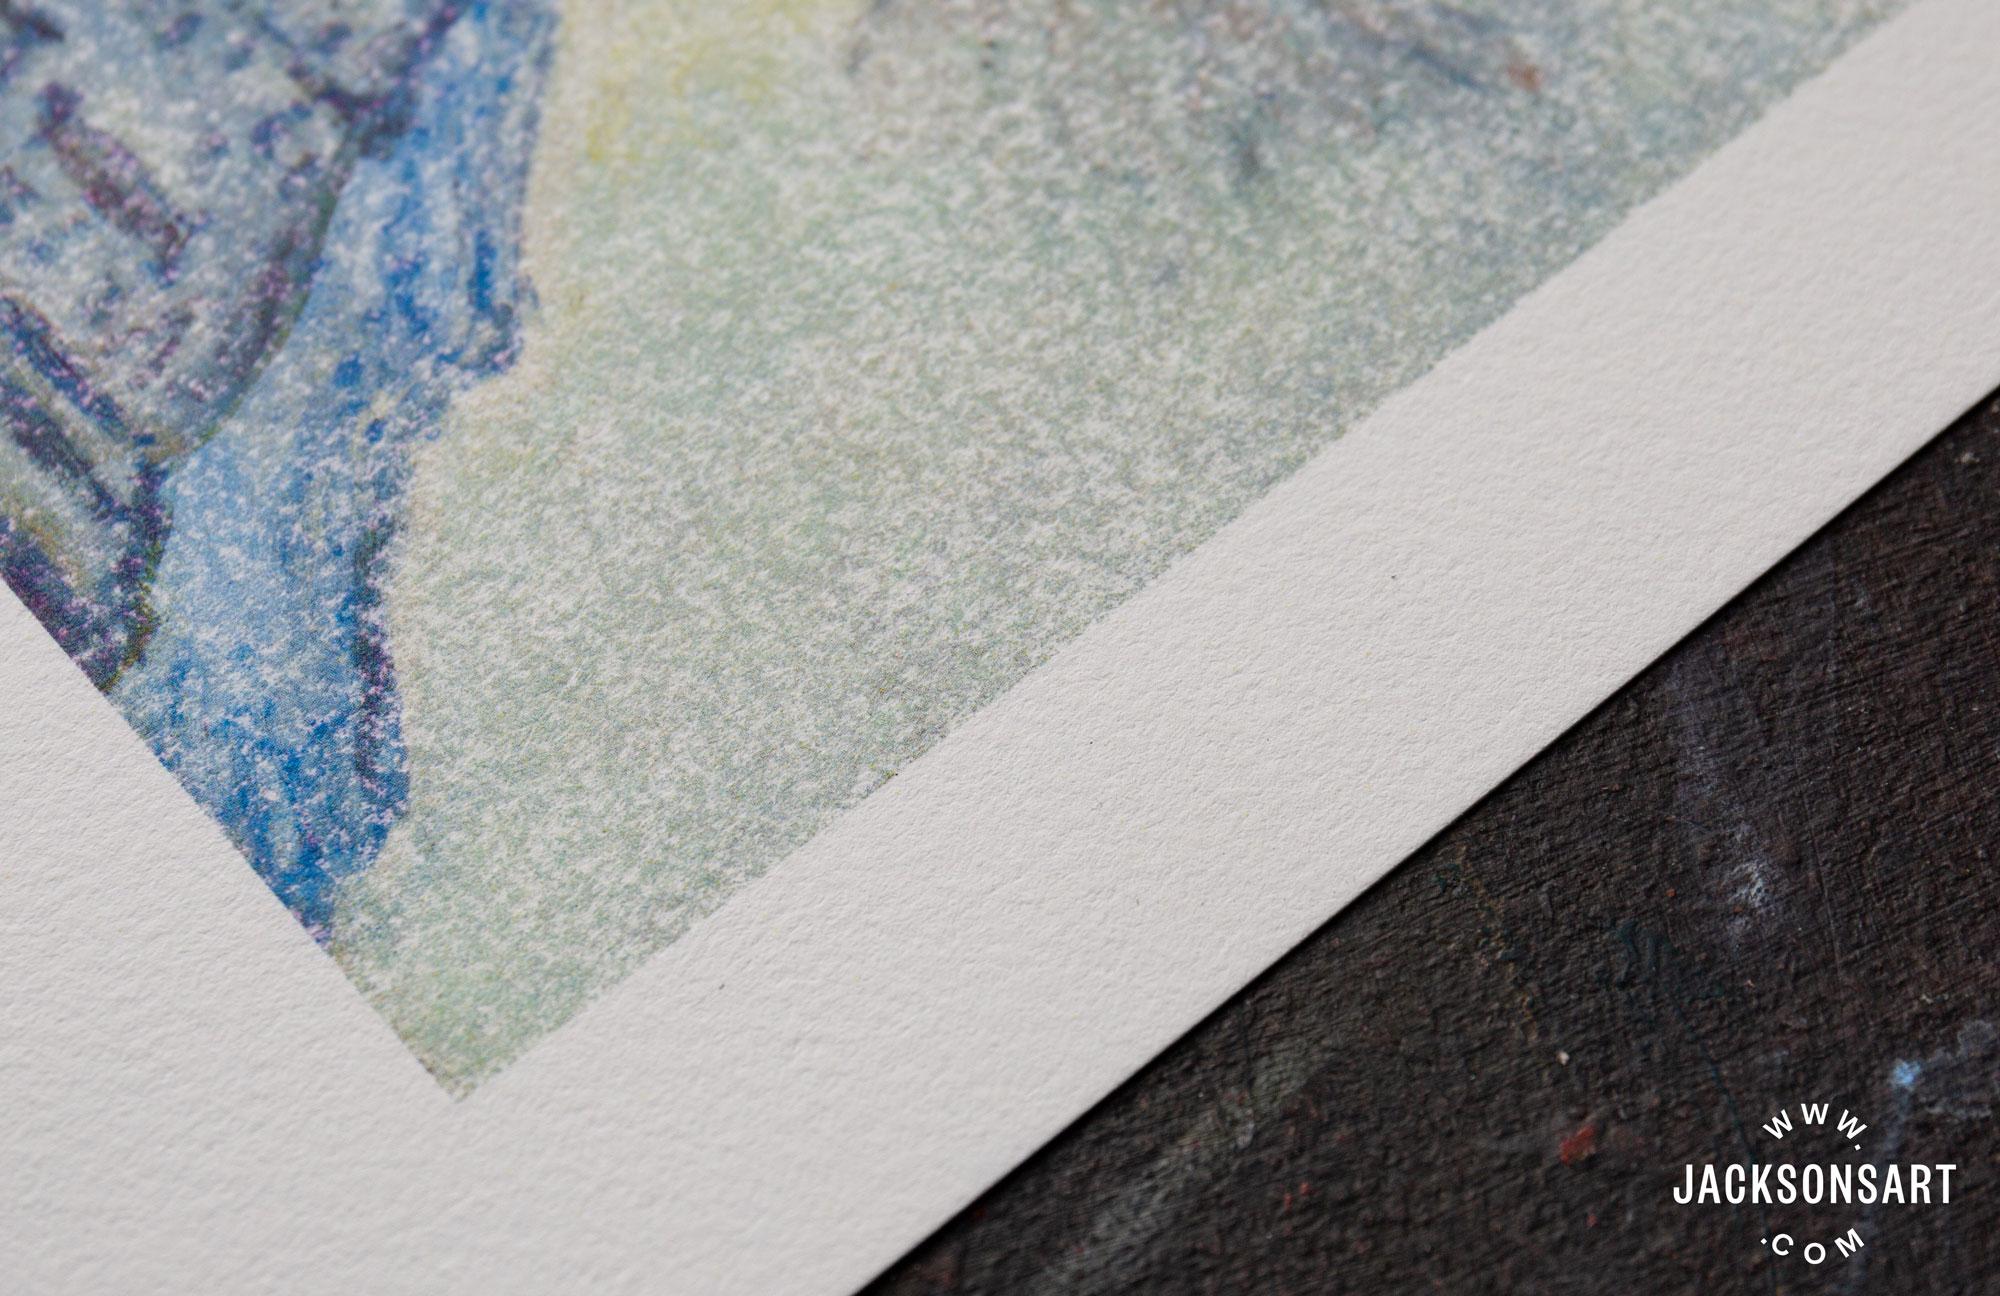 St Cutherberts Mill Somerset Enhanced, 225gsm Mould-Made 100% Cotton Art Print